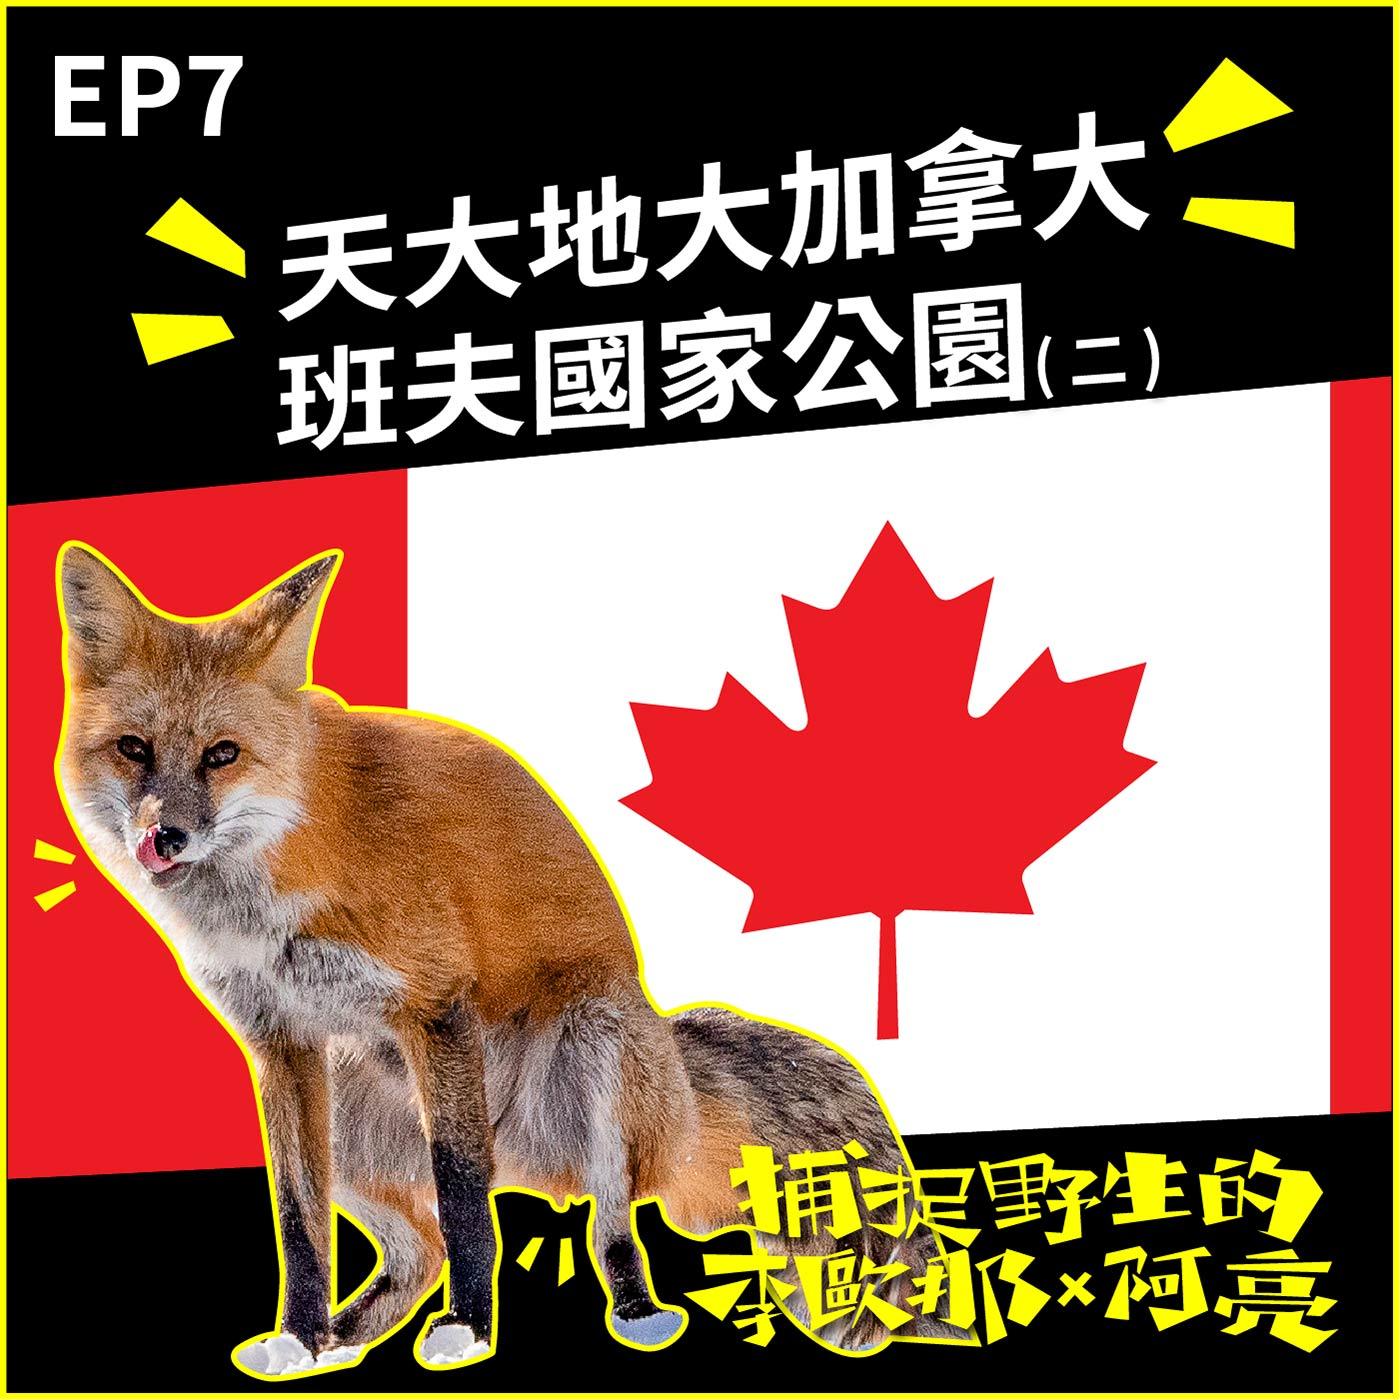 EP.7 天大地大加拿大-班夫國家公園(二)